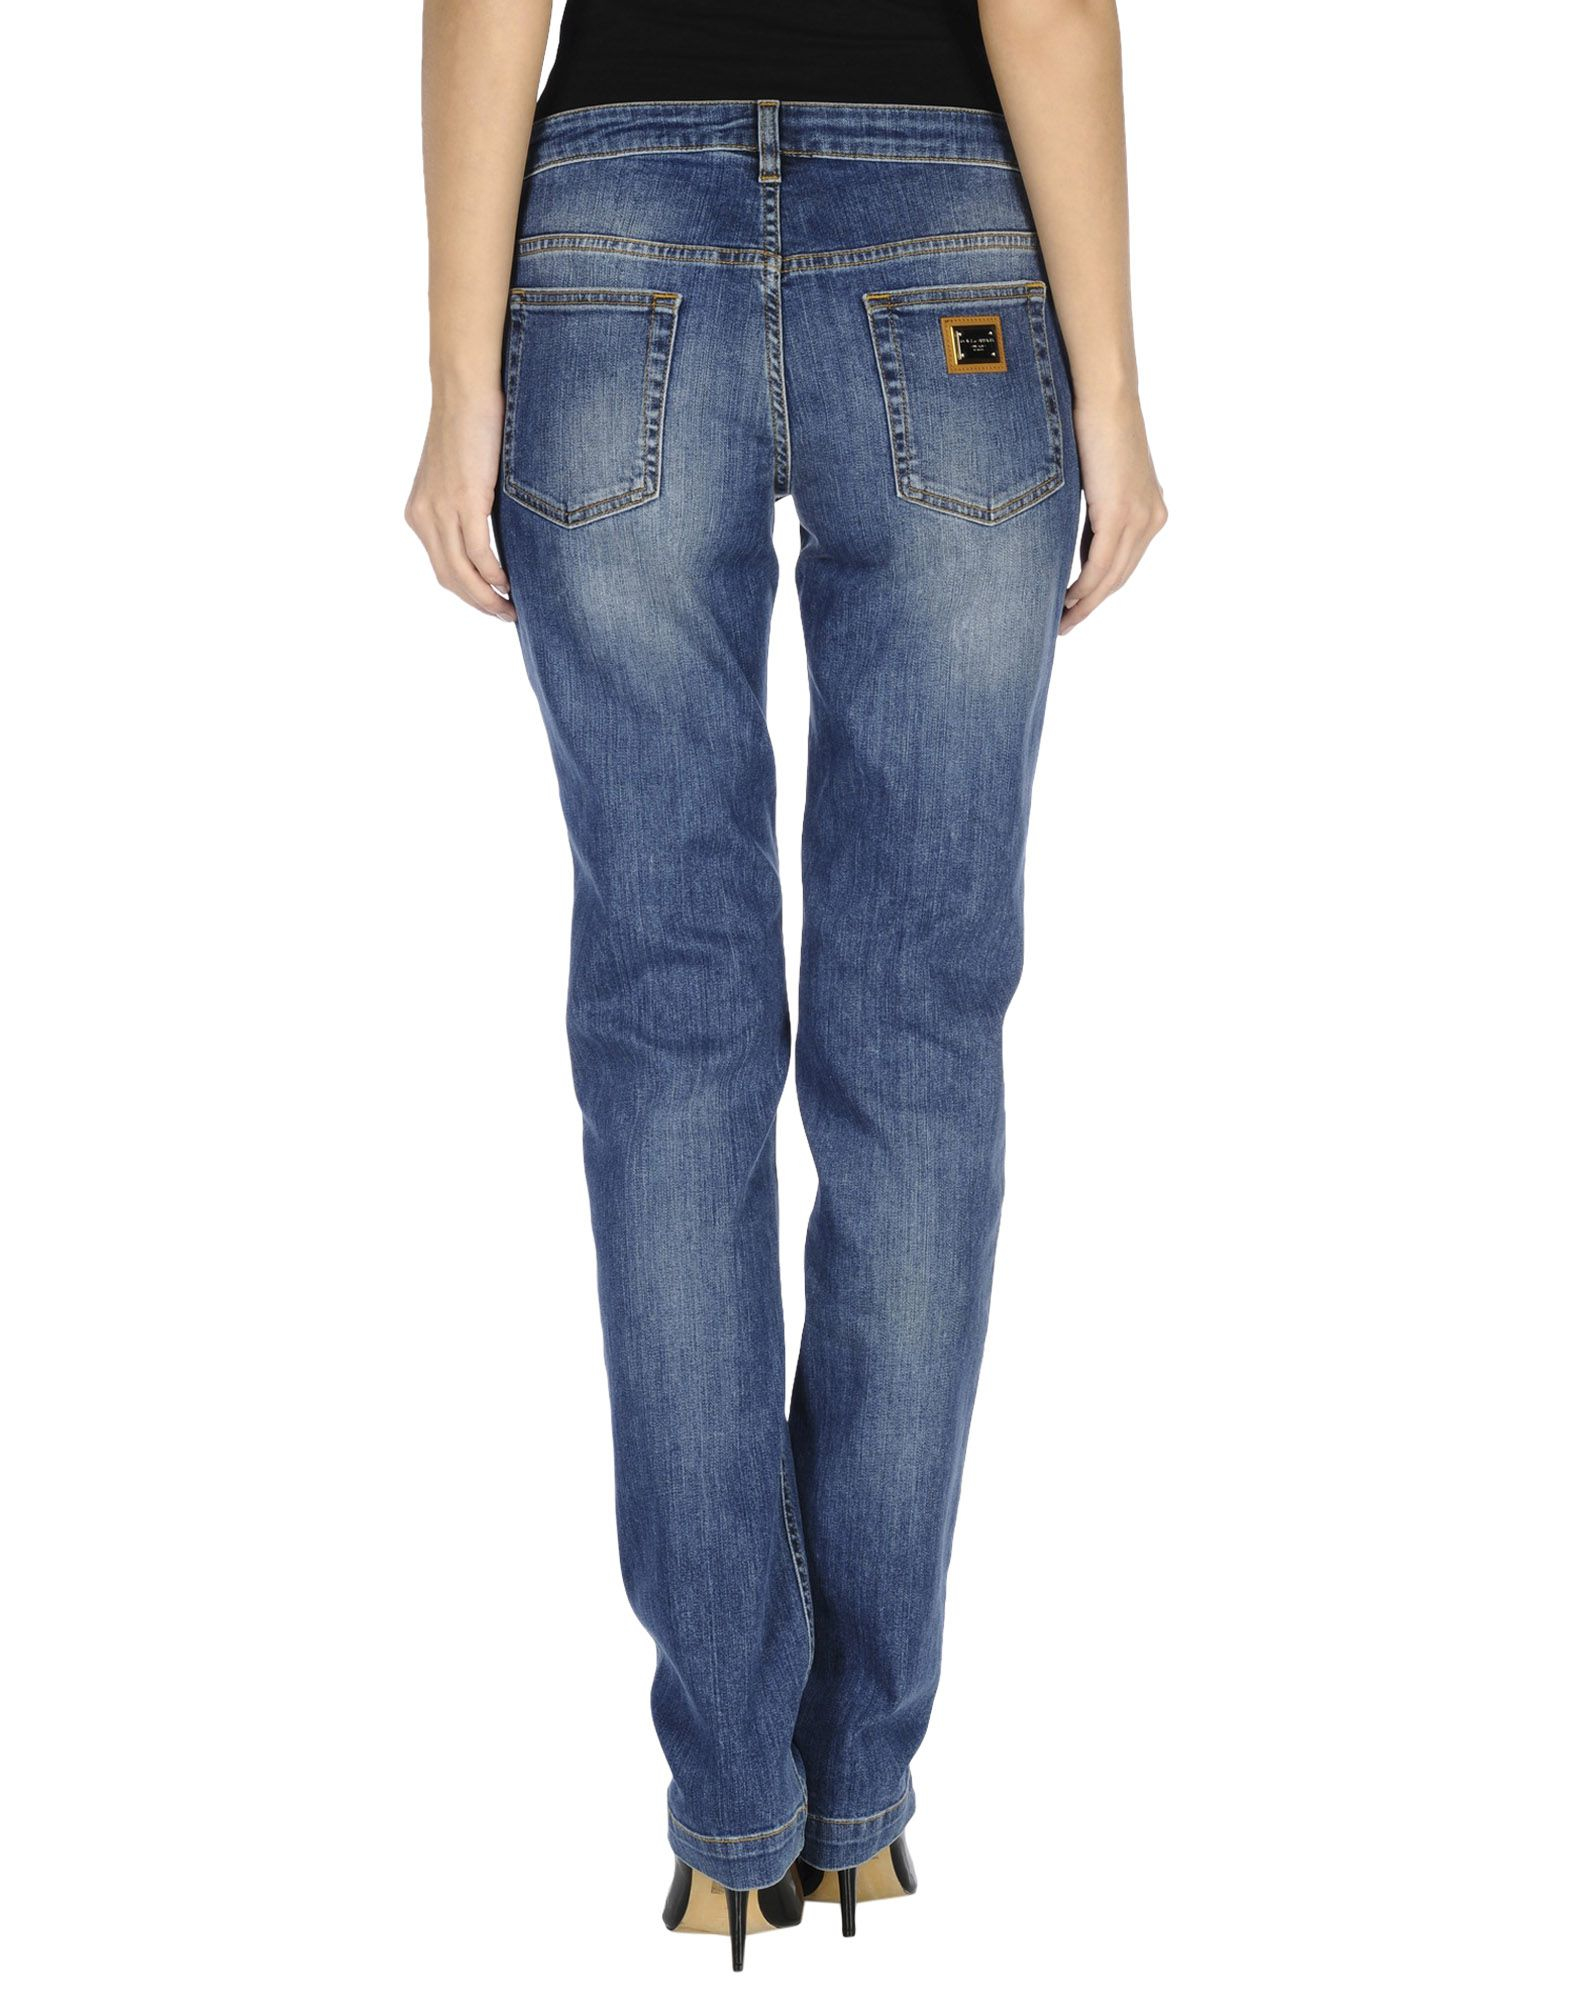 lyst dolce gabbana denim trousers in blue. Black Bedroom Furniture Sets. Home Design Ideas